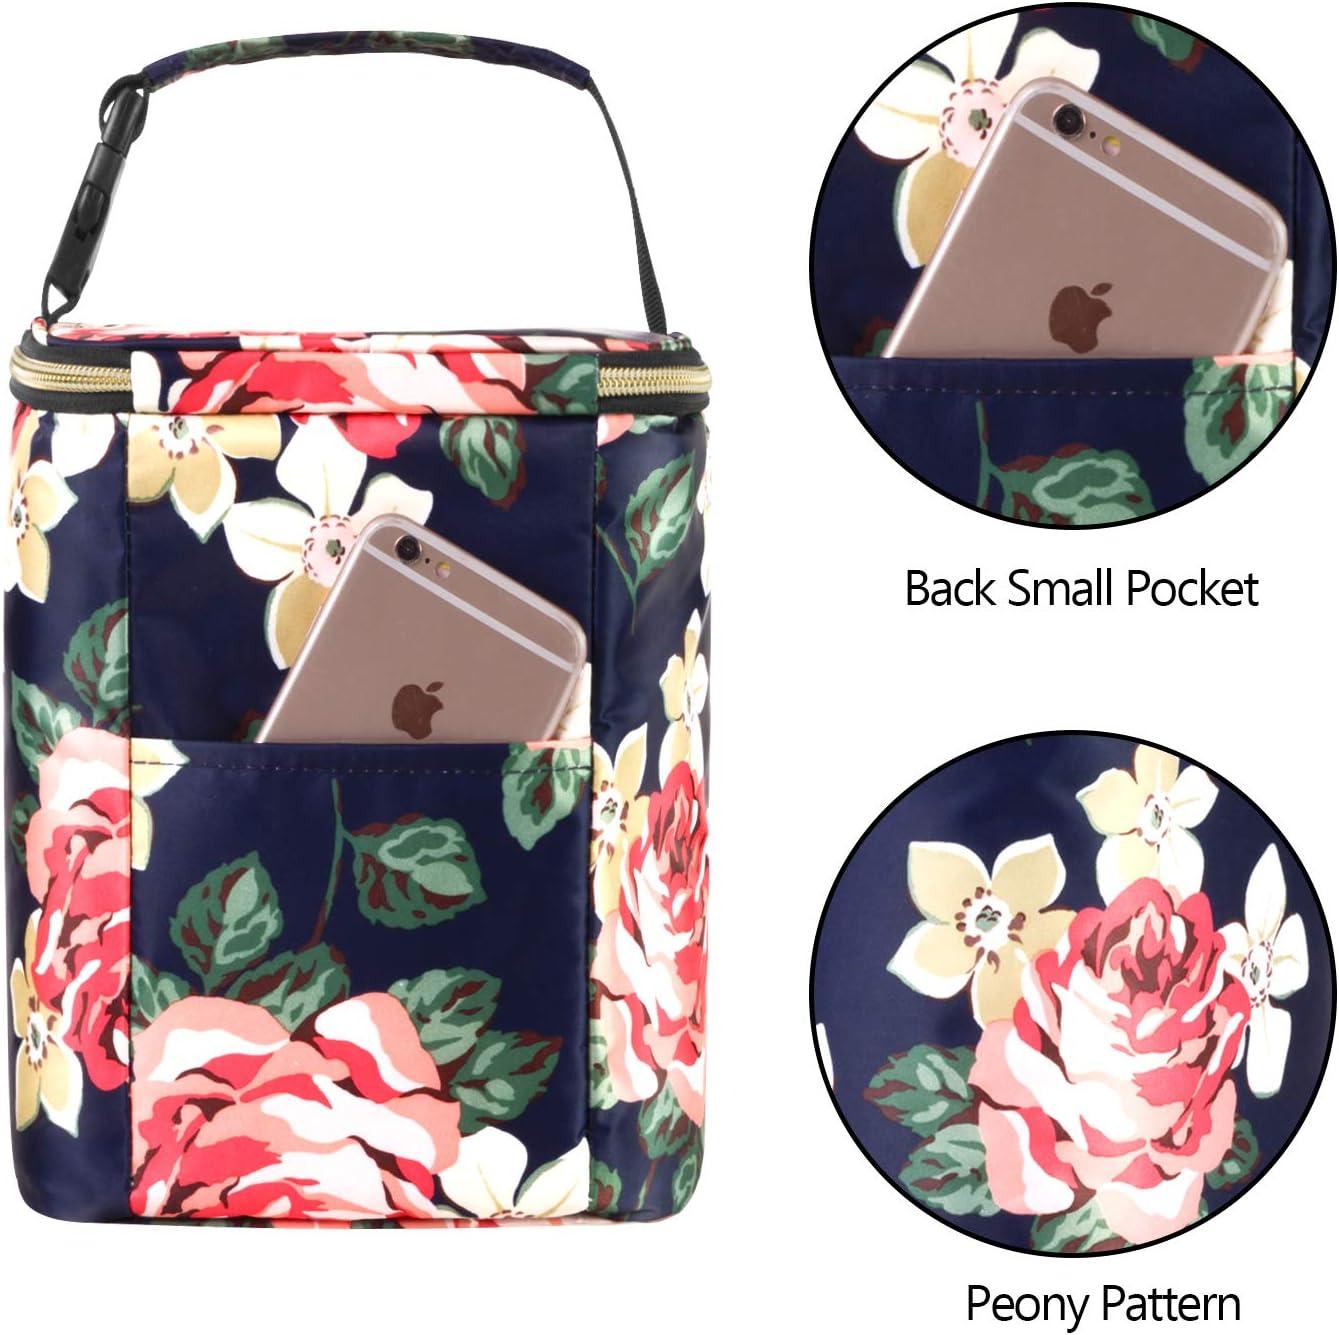 Beige Dandelion and Ice Pack Teamoy Breastmilk Cooler Bag up to 270ml Baby Bottle Cooler Bag for 4 Baby Breastmilk Bottles